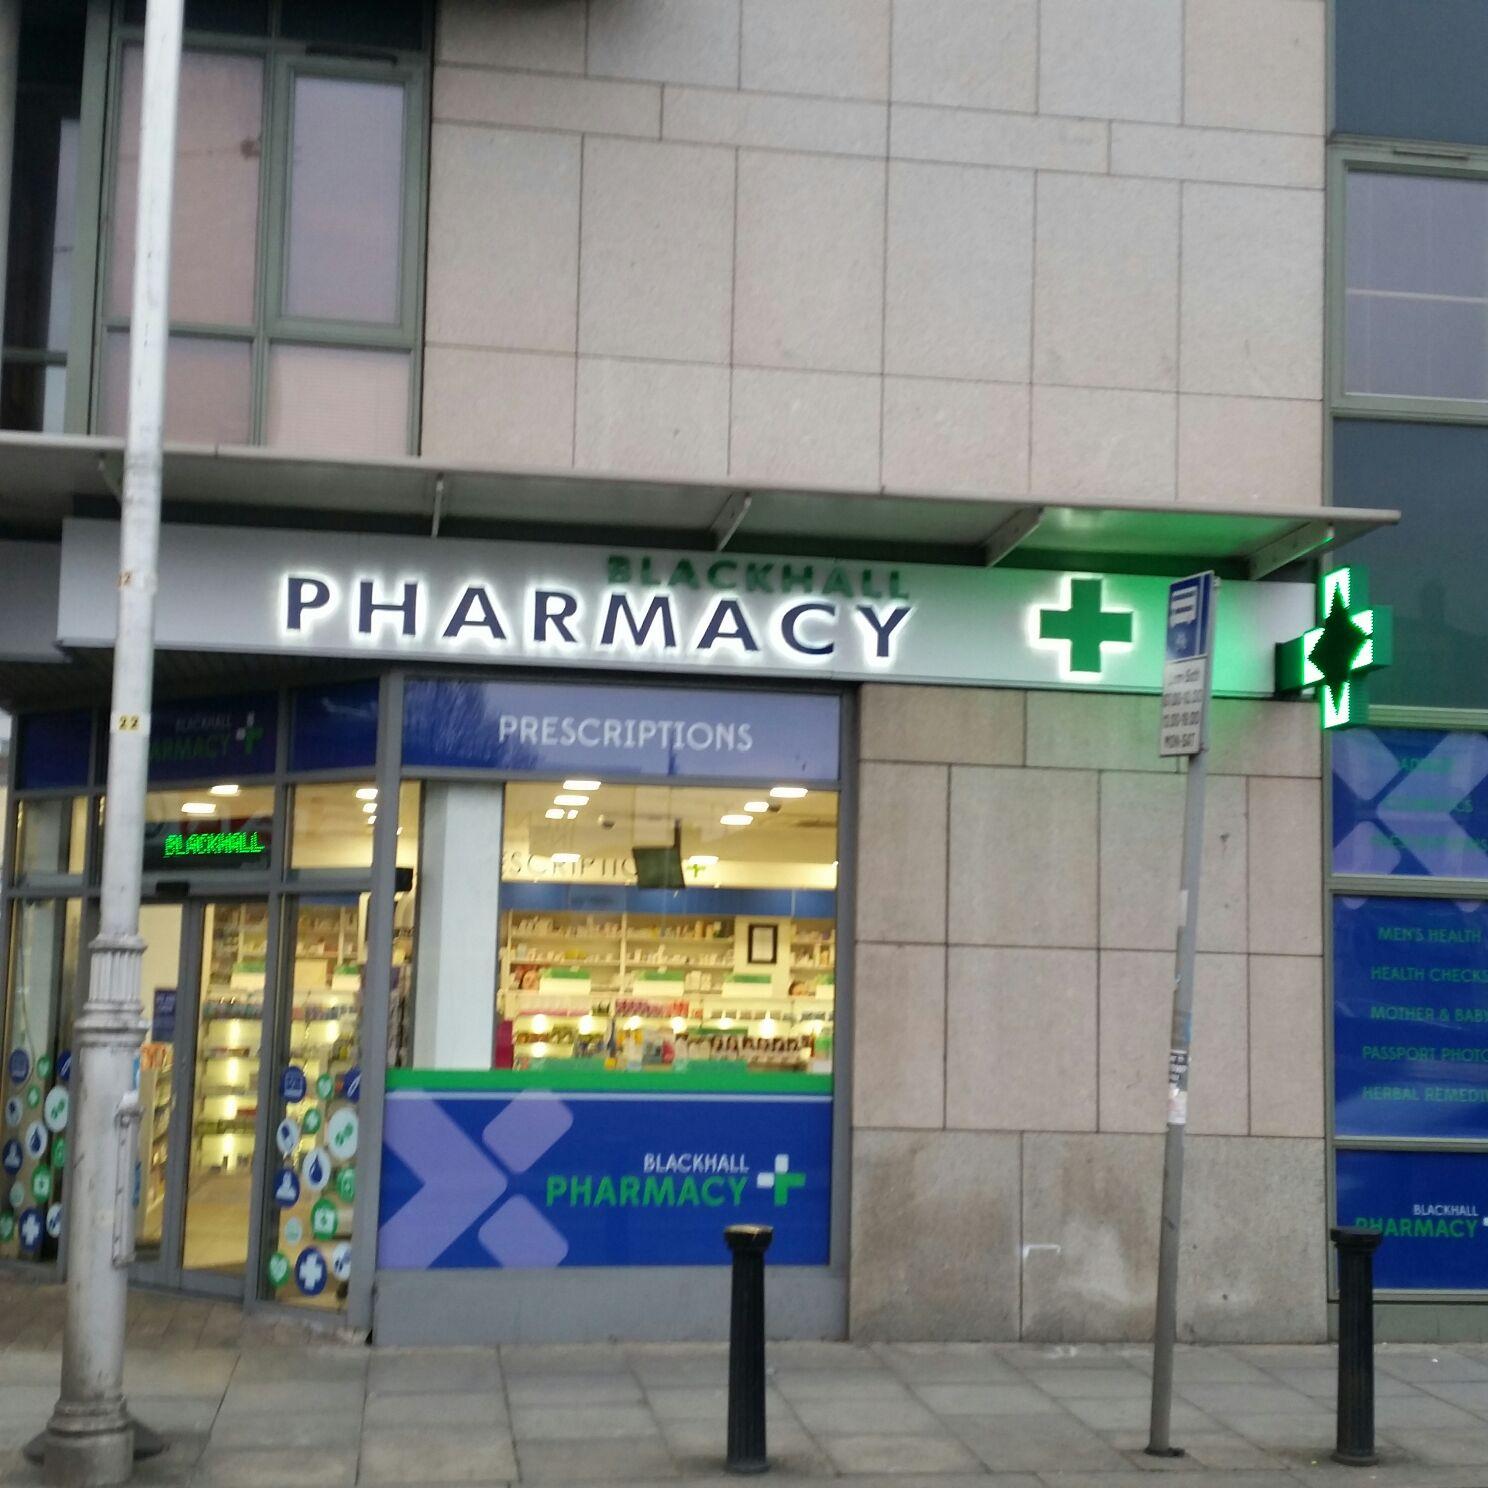 Pharmacy Exterior Signage_Pharmacy L